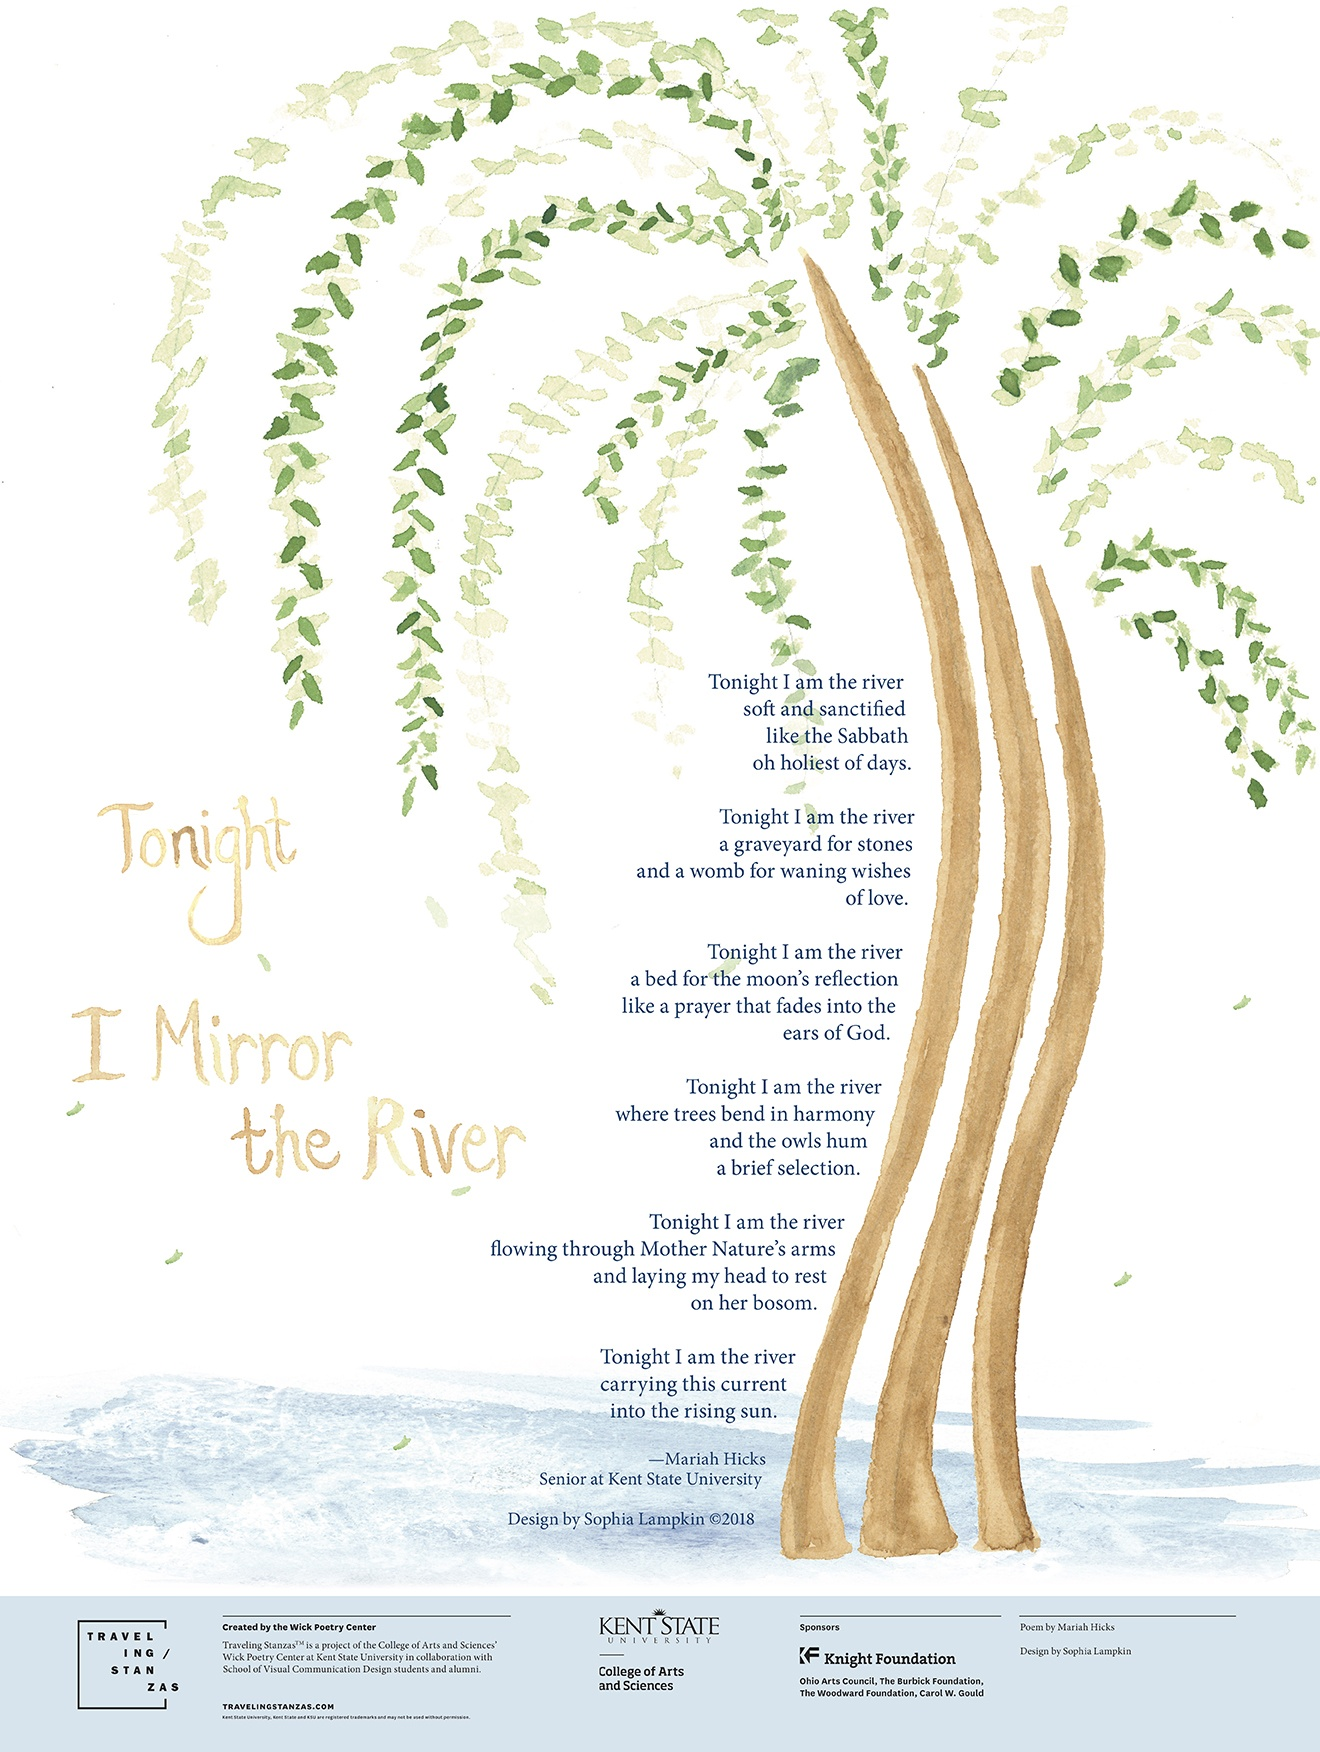 Tonight I Mirror the River_18x24_Lampkin